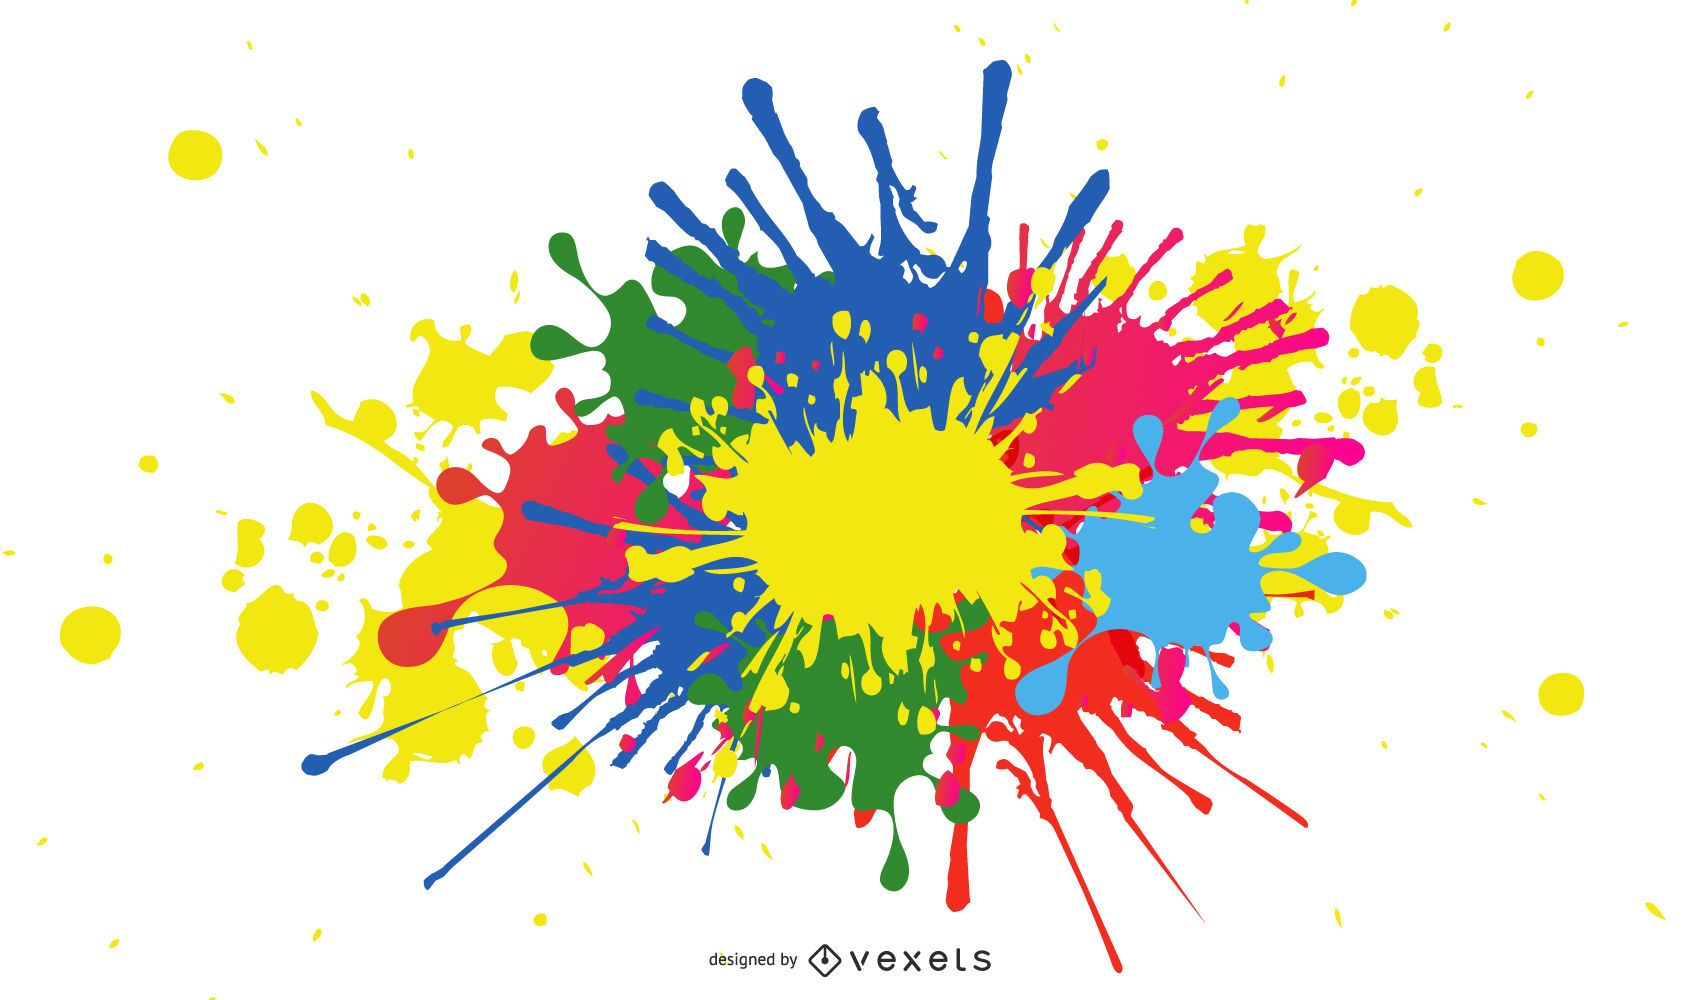 Salpicaduras de tinta con pintura de colores de fondo